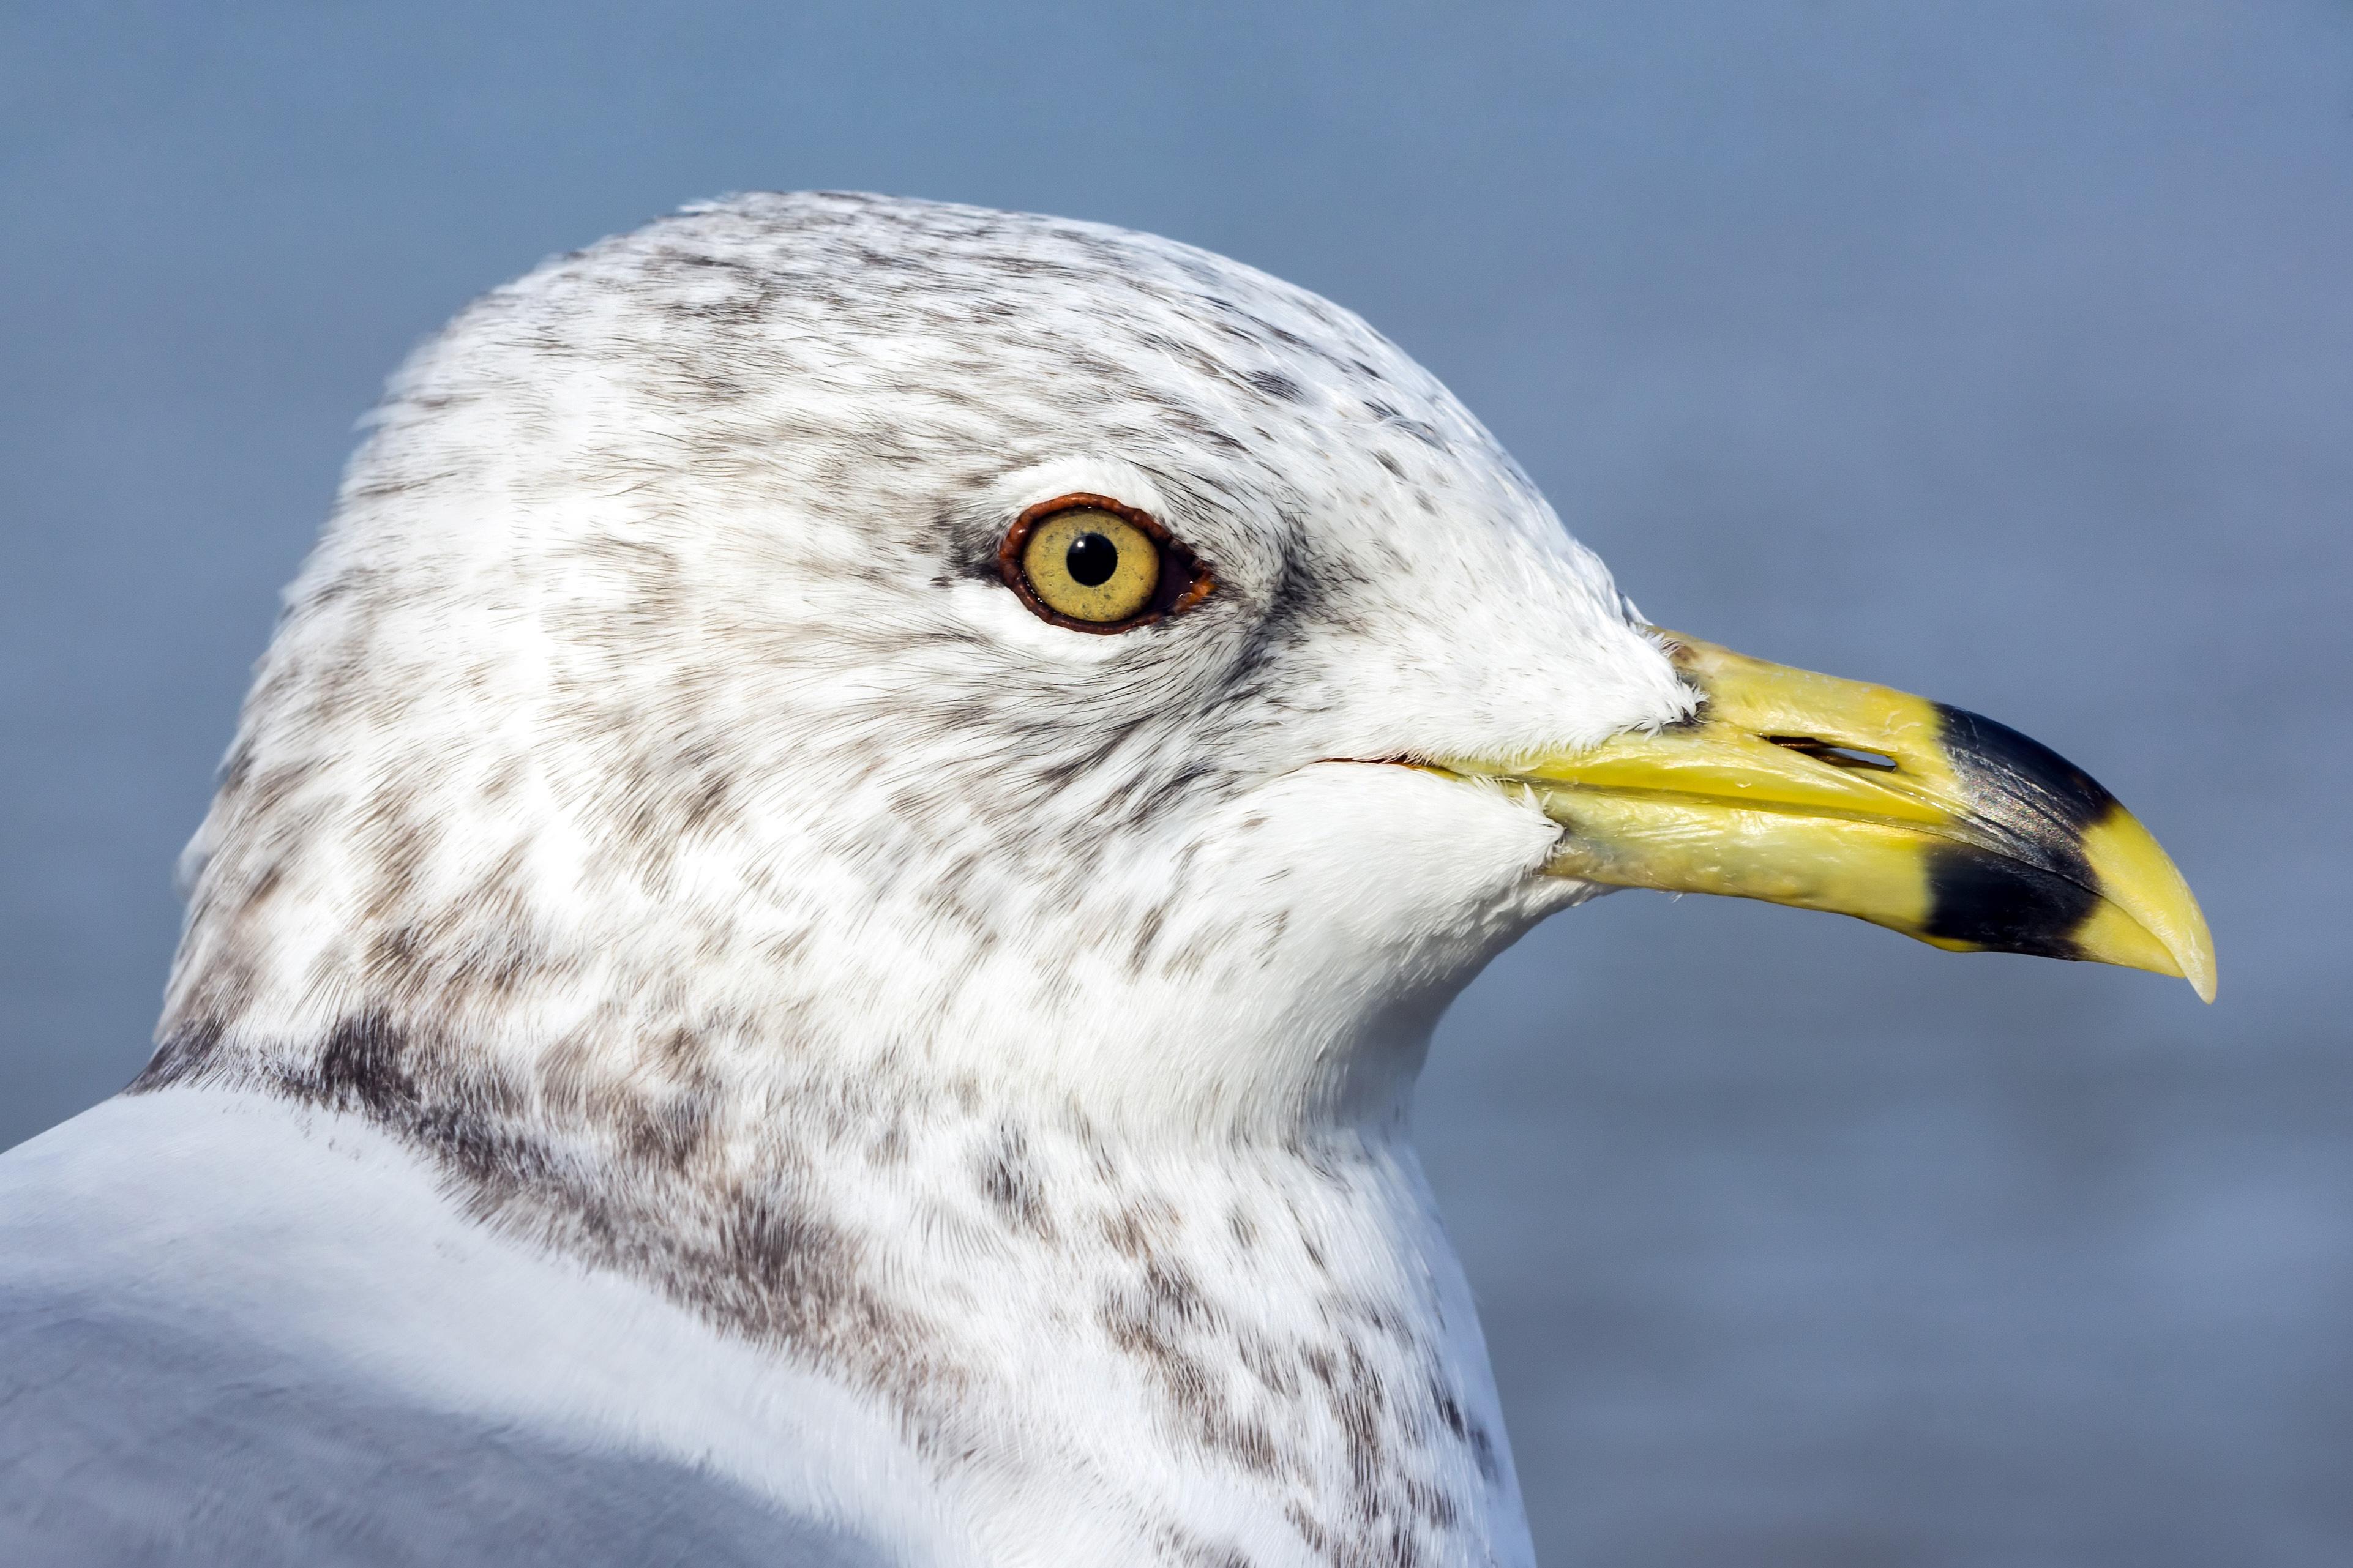 Portrait of Ring-billed gull (Larus delawarensis) in winter plumage, Windsor, Ontario, 2014-12-07